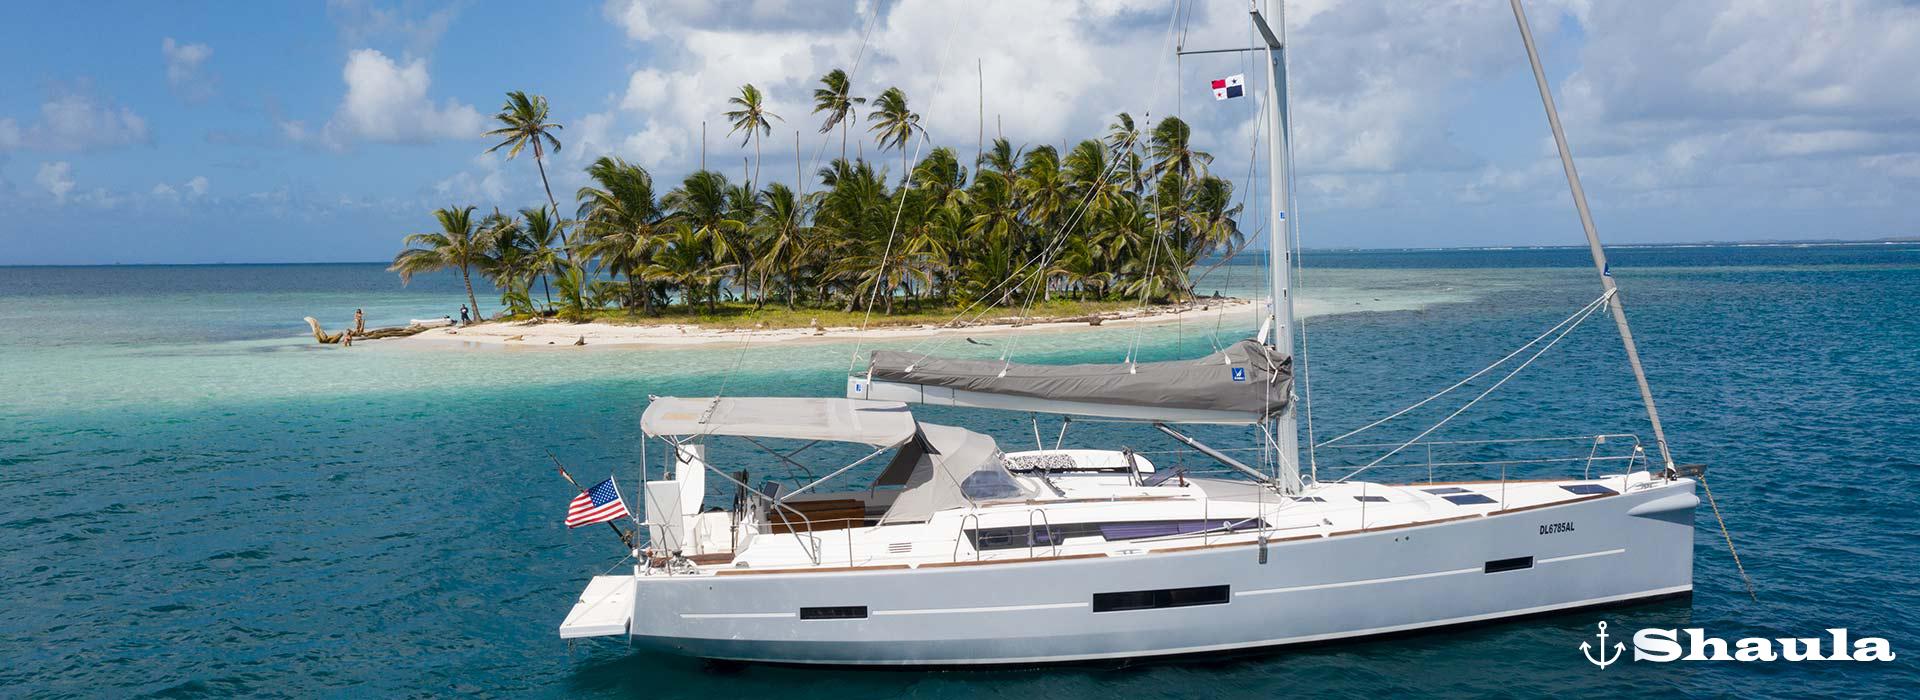 shaula-yacht-san-blas-islands